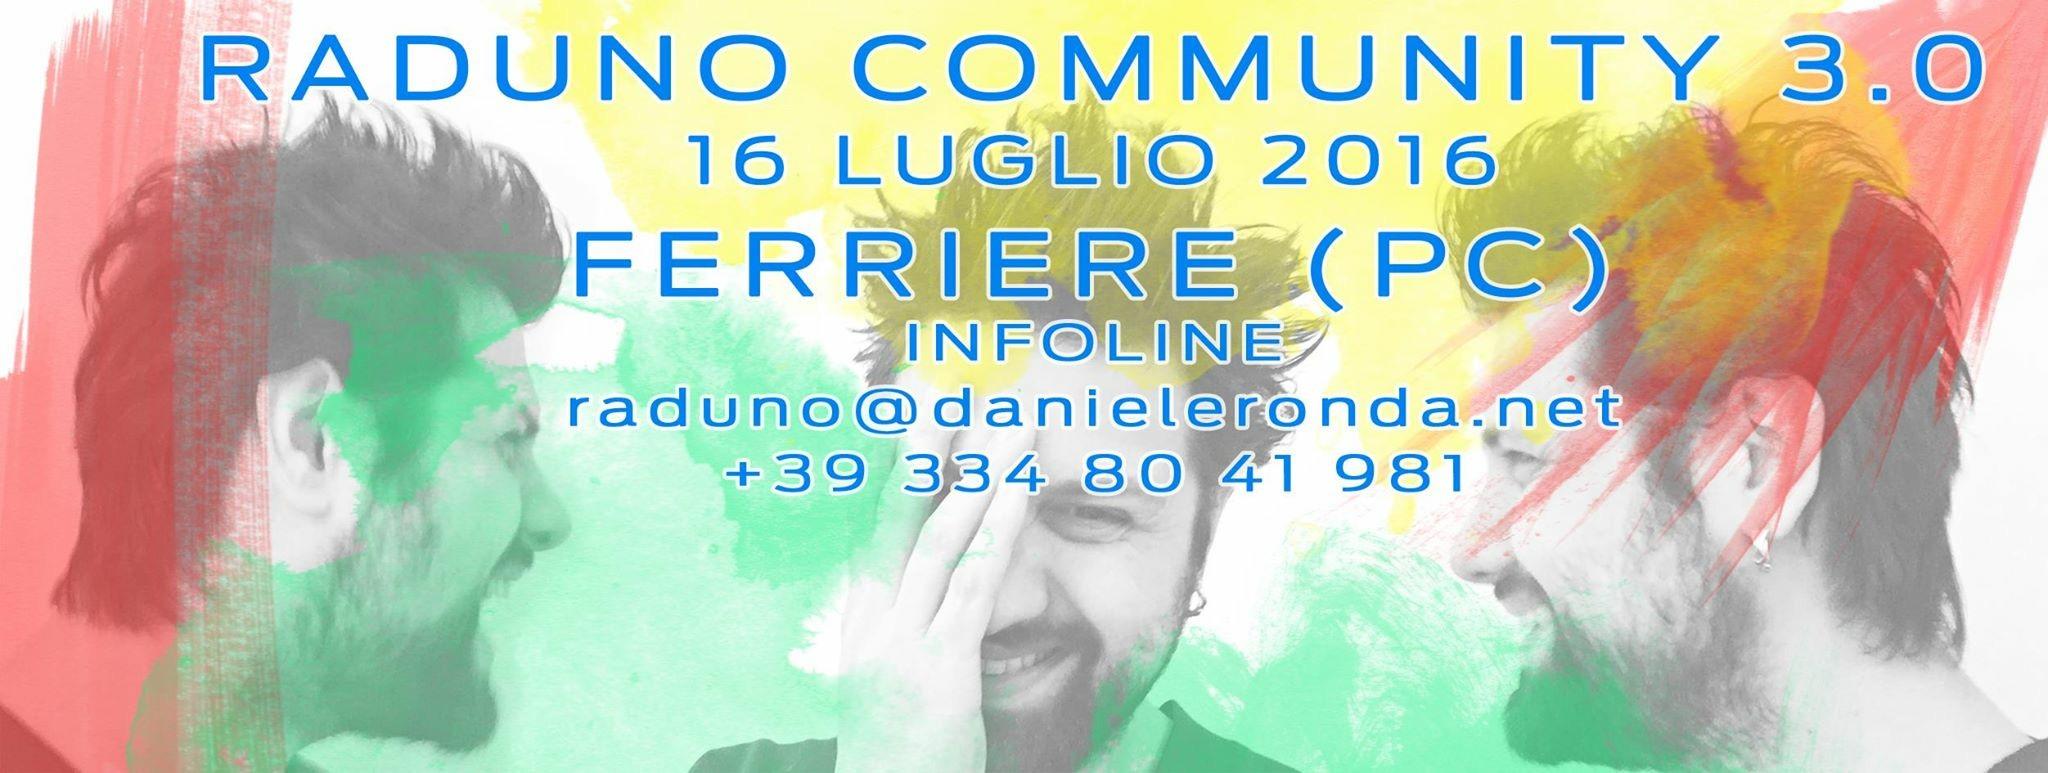 FESTINQUOTA 2016 – RADUNO COMMUNITY 3.0 – SABATO 16 LUGLIO